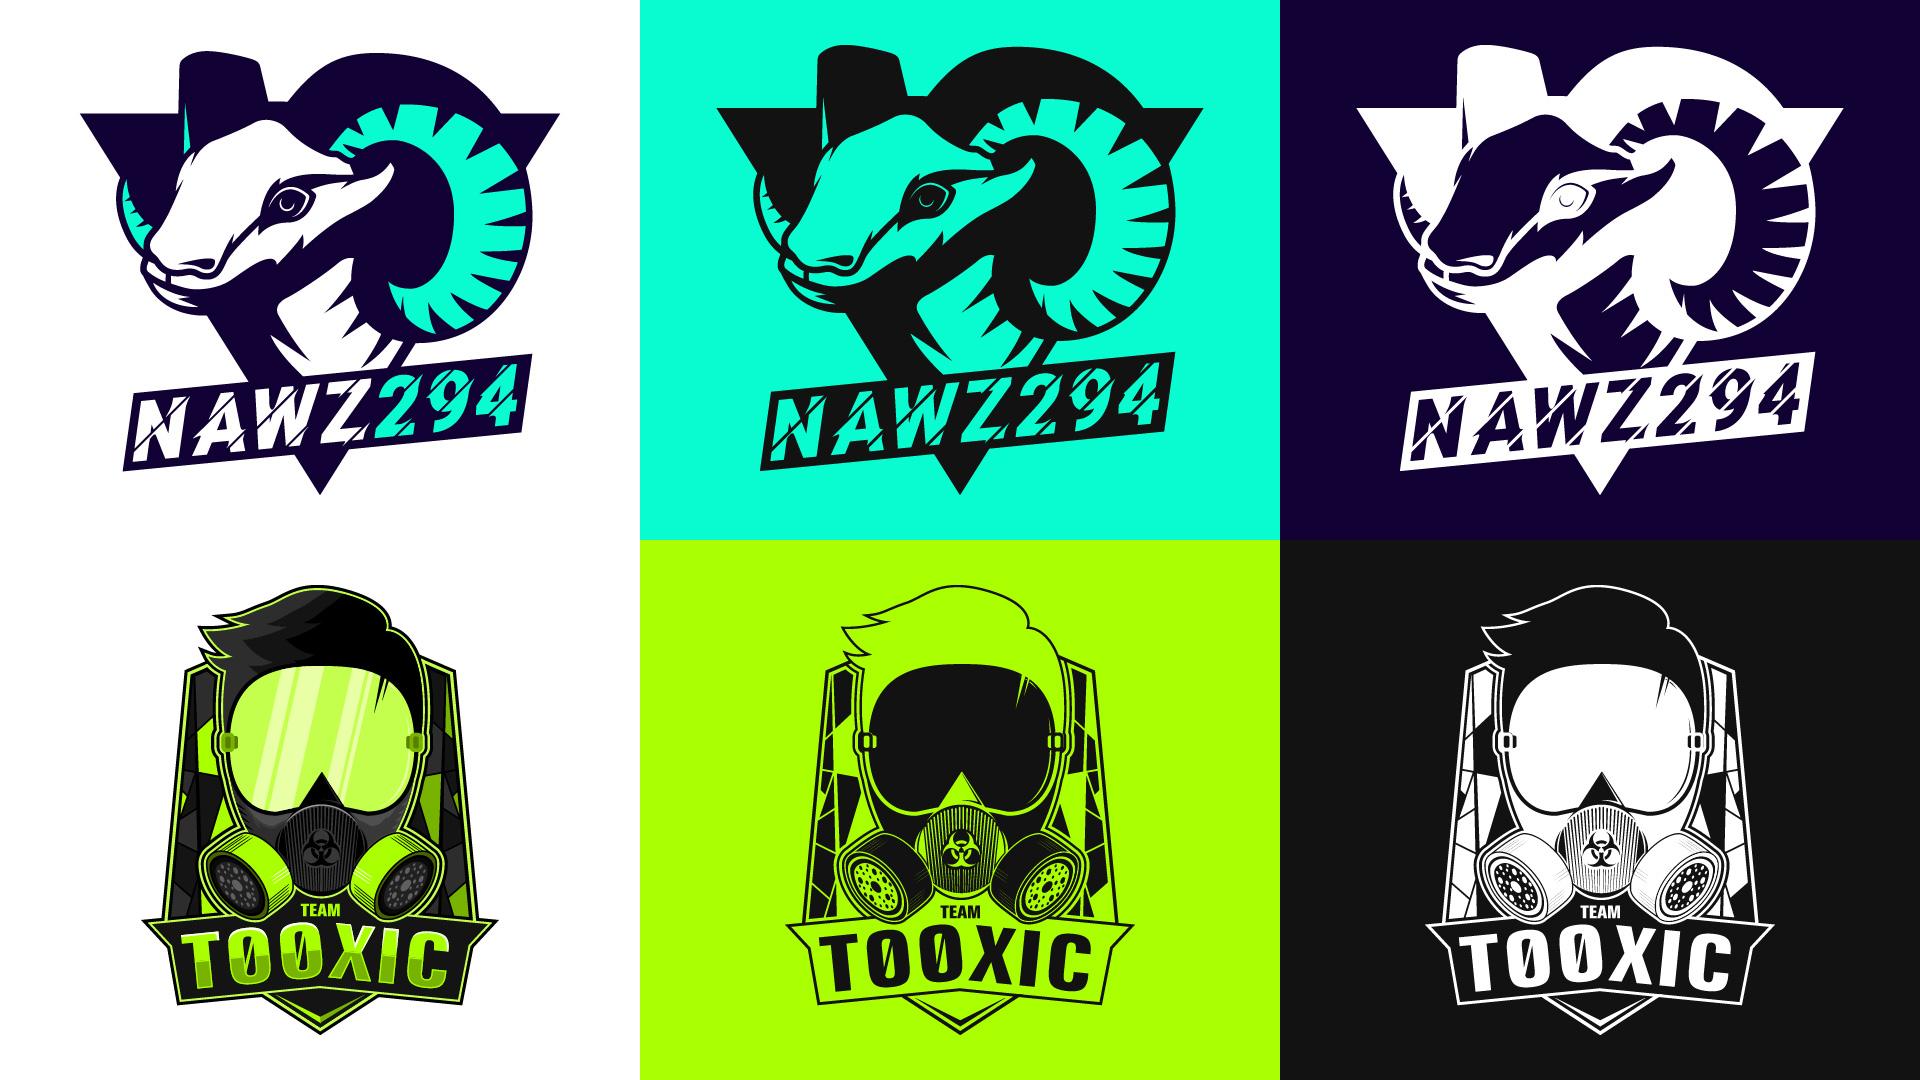 nawz294 & Team Tooxic Logos